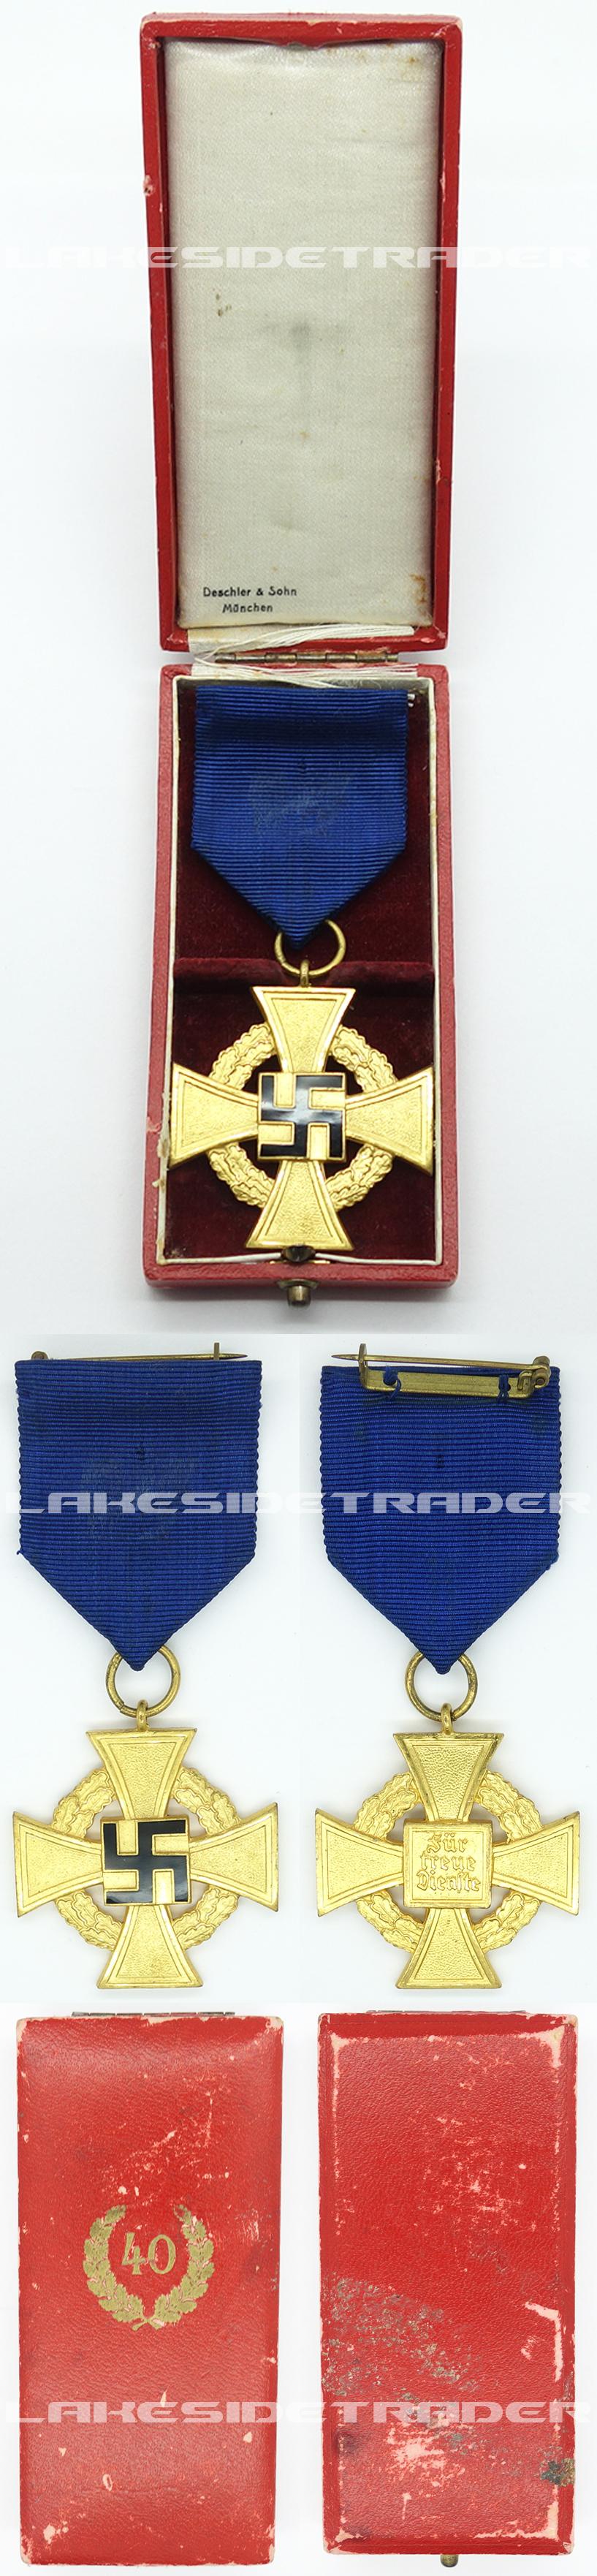 Cased 40 Year Faithful Service Cross